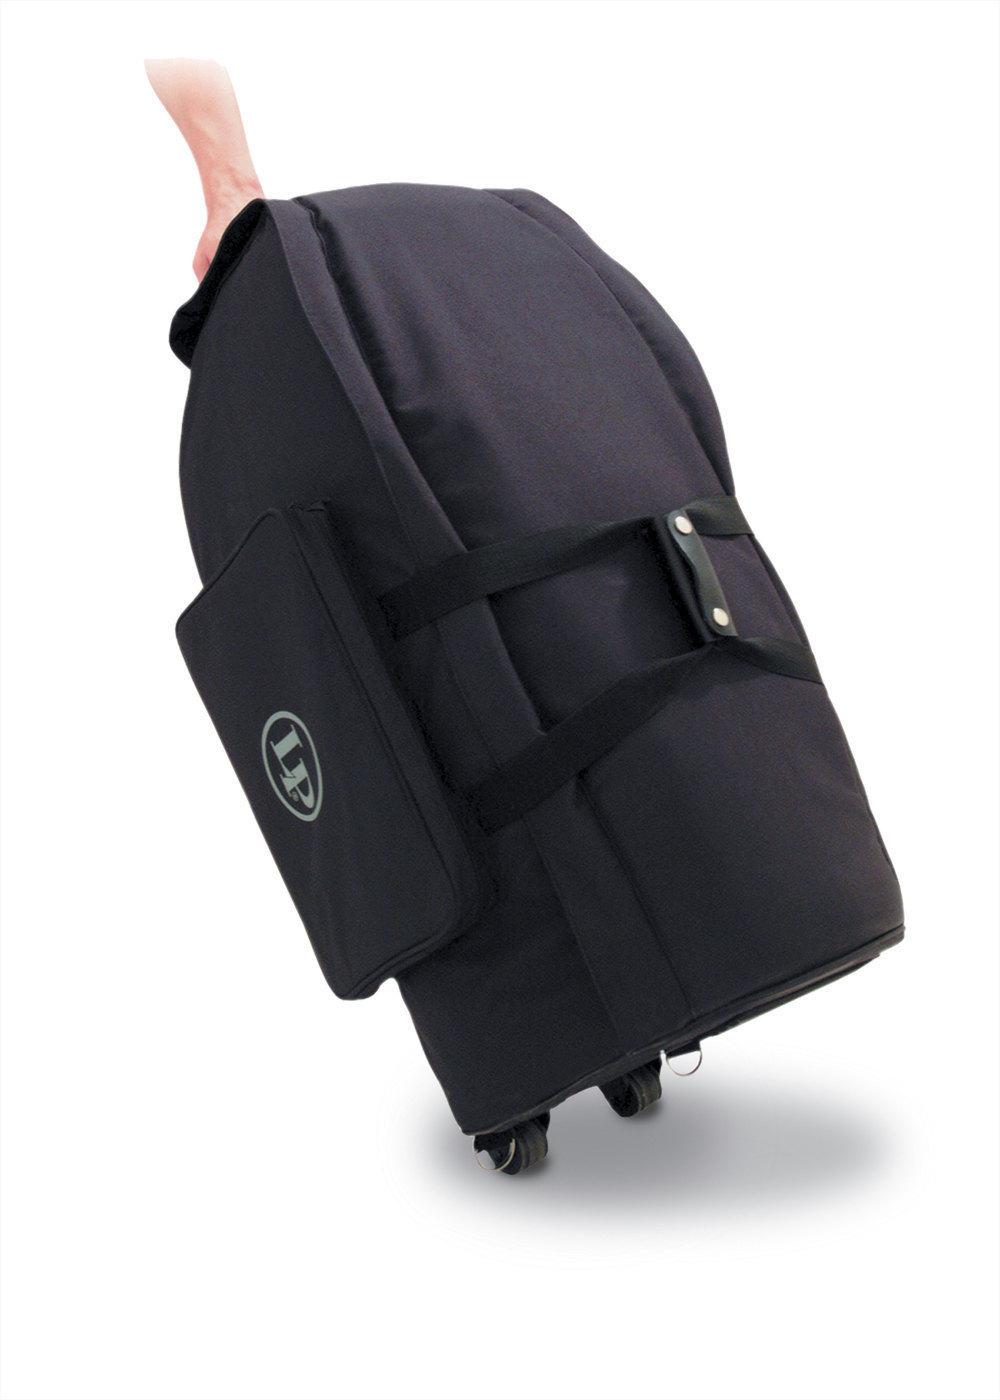 Conga bag Pro